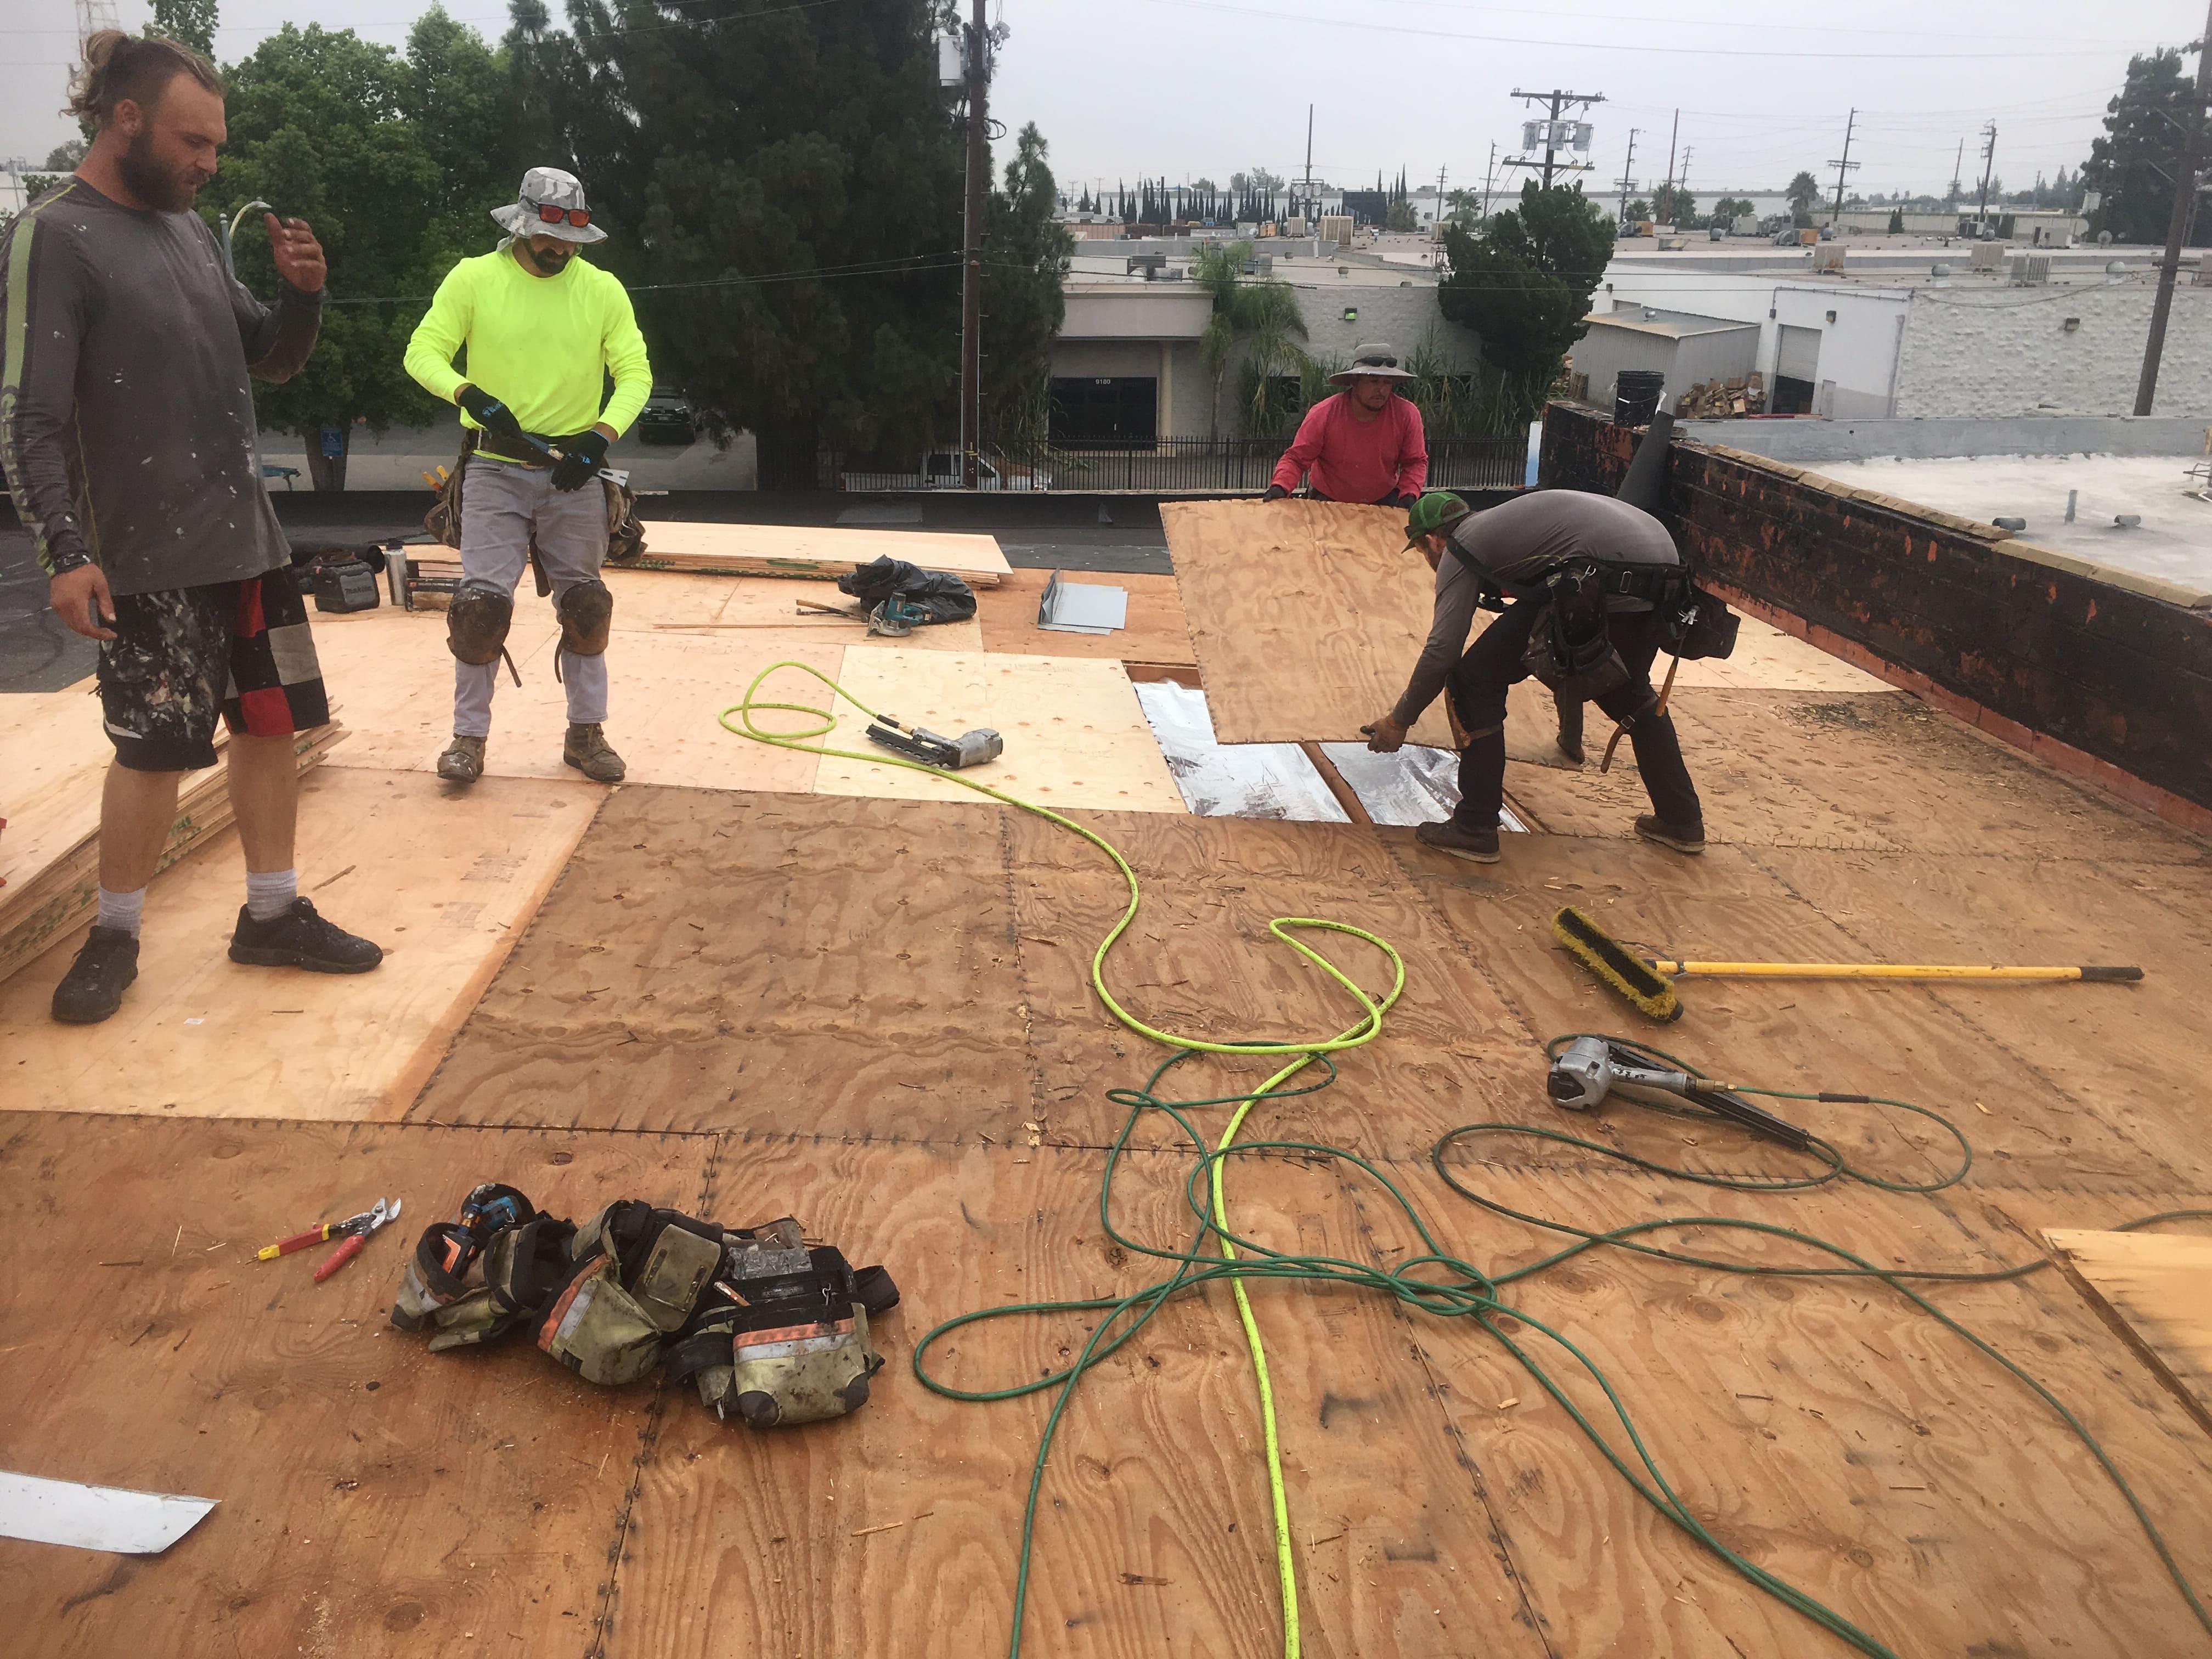 Paul Bancroft Roofing